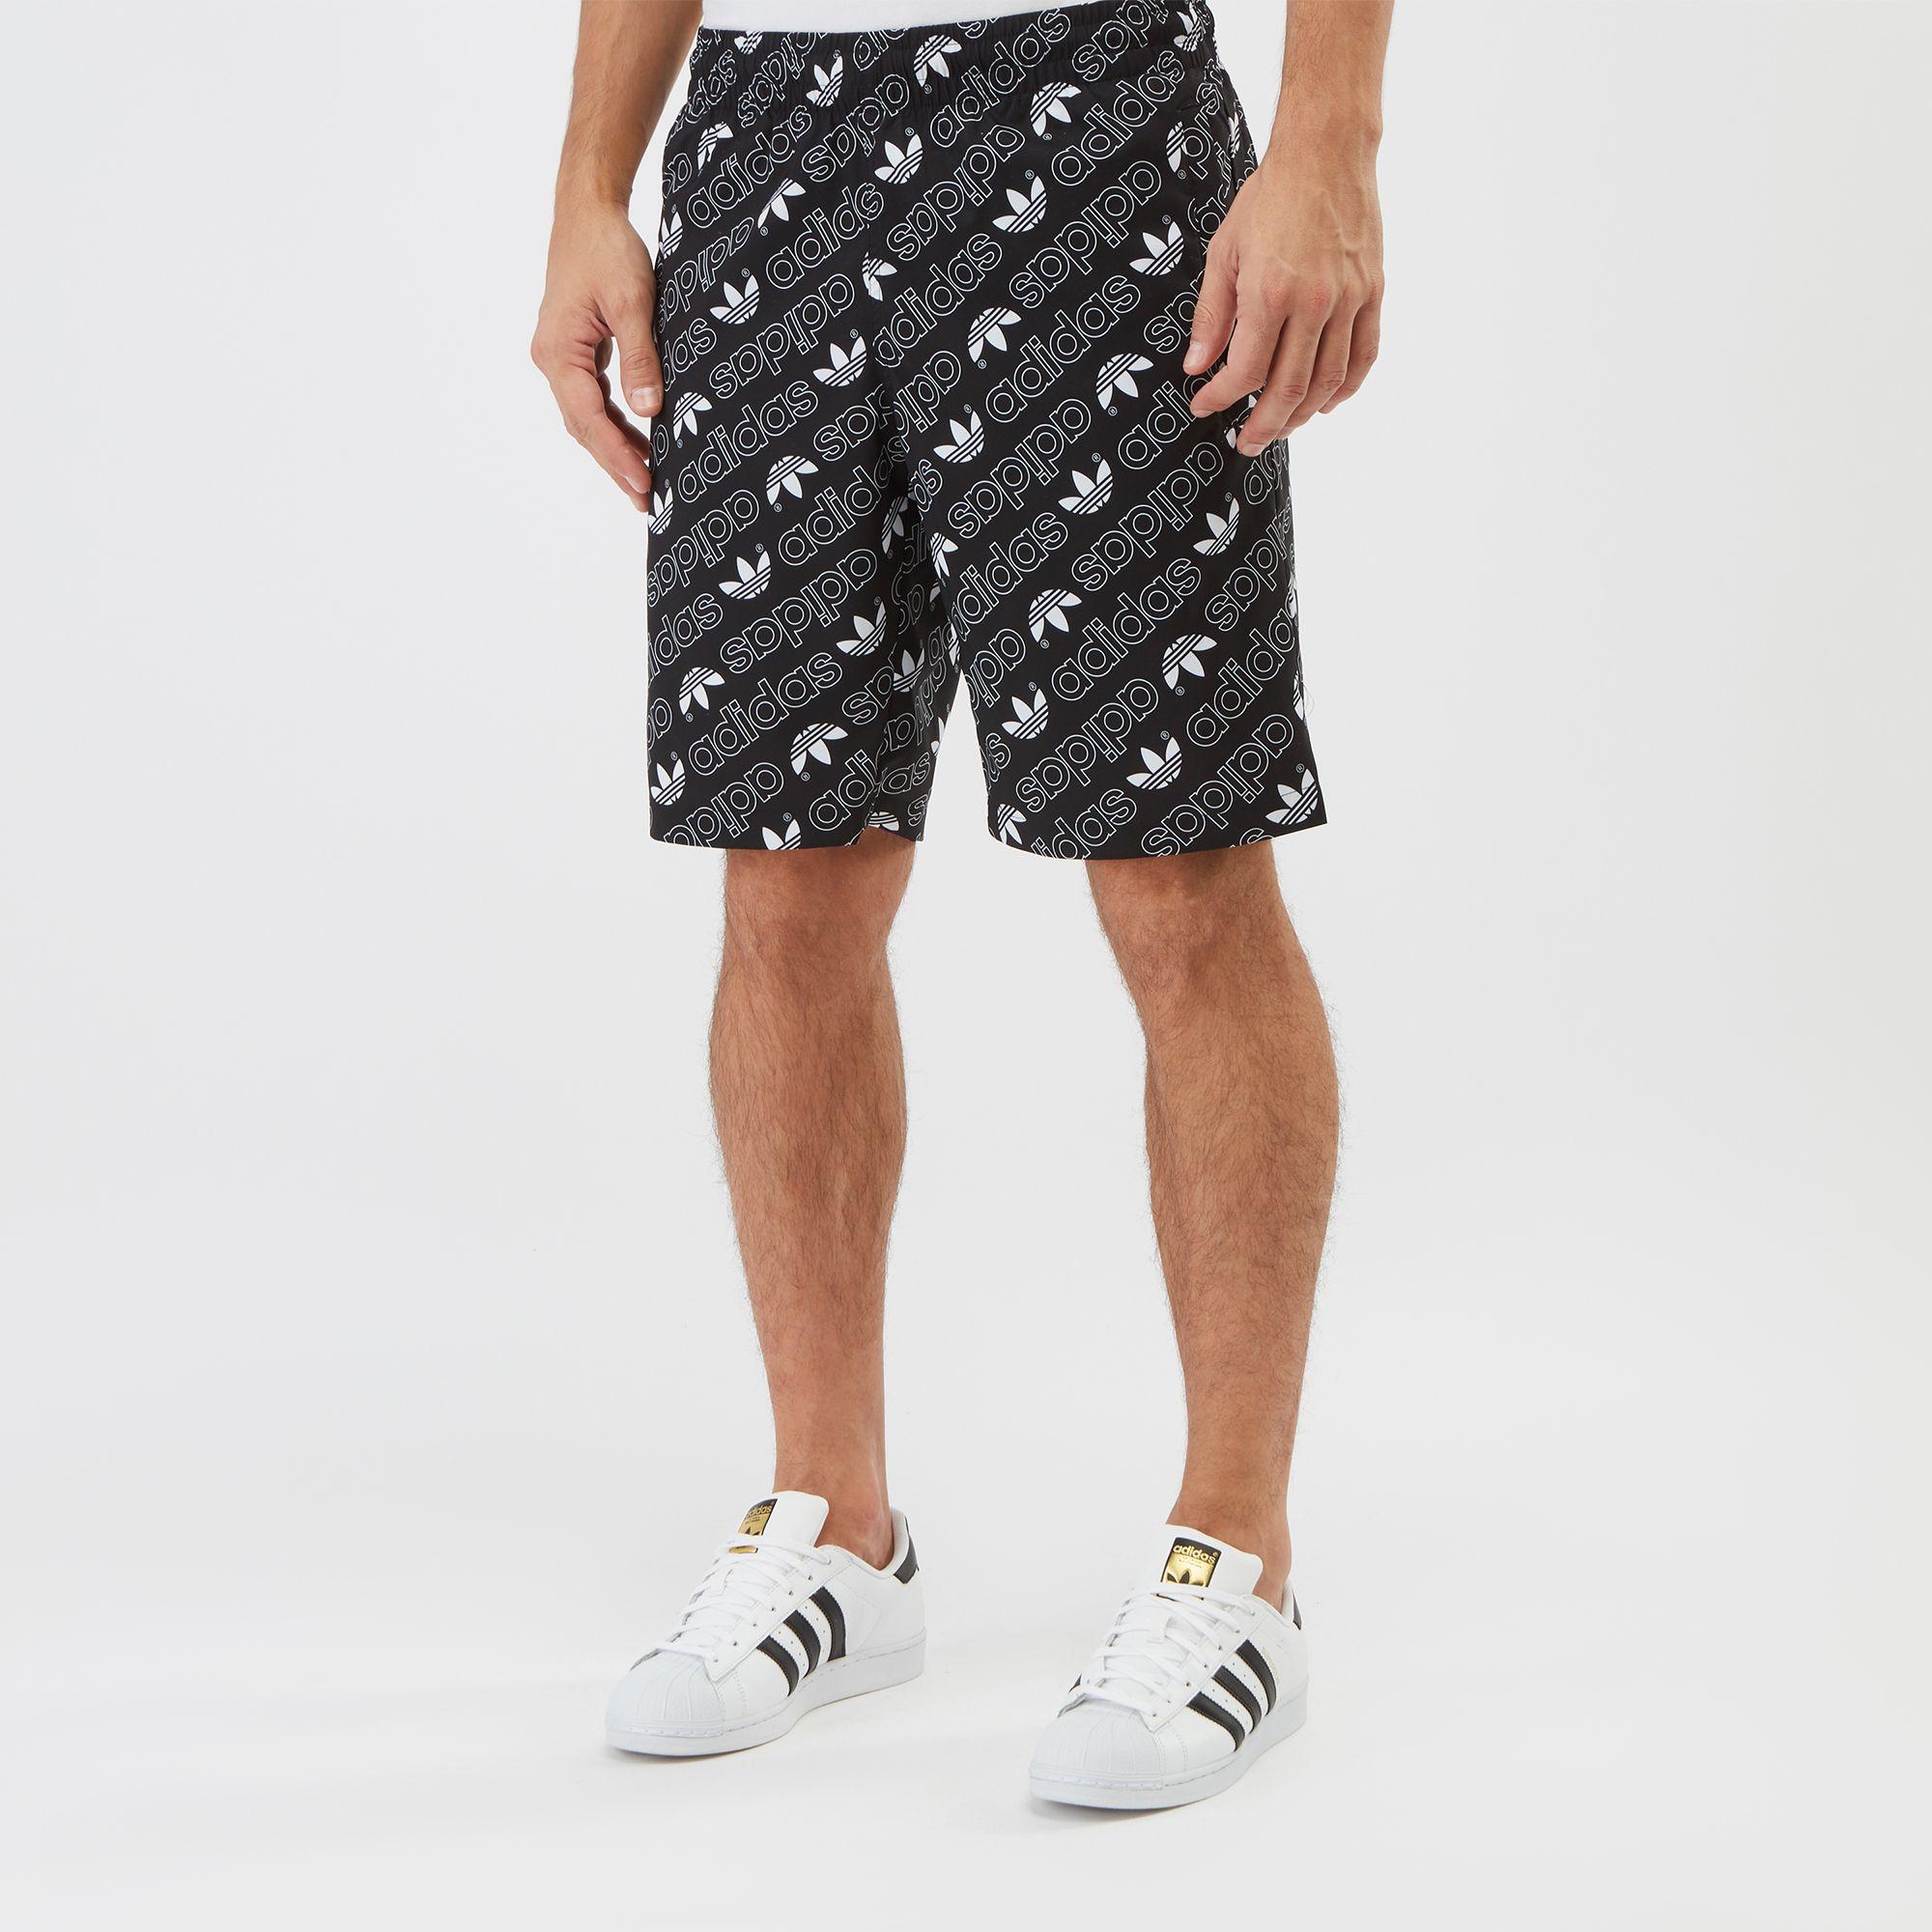 Shorts Monogram adidas Grey Men